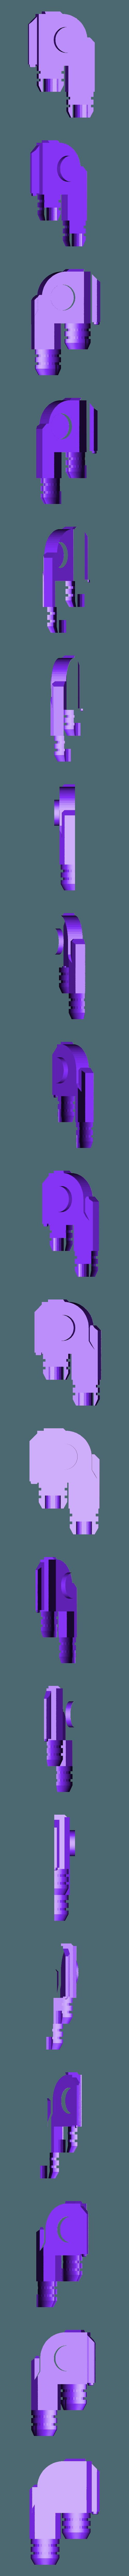 Gun_Left_Bottom.stl Download free STL file Interstellar Army - Quad Mortar and Quad Cannon • 3D printing model, Cikkirock